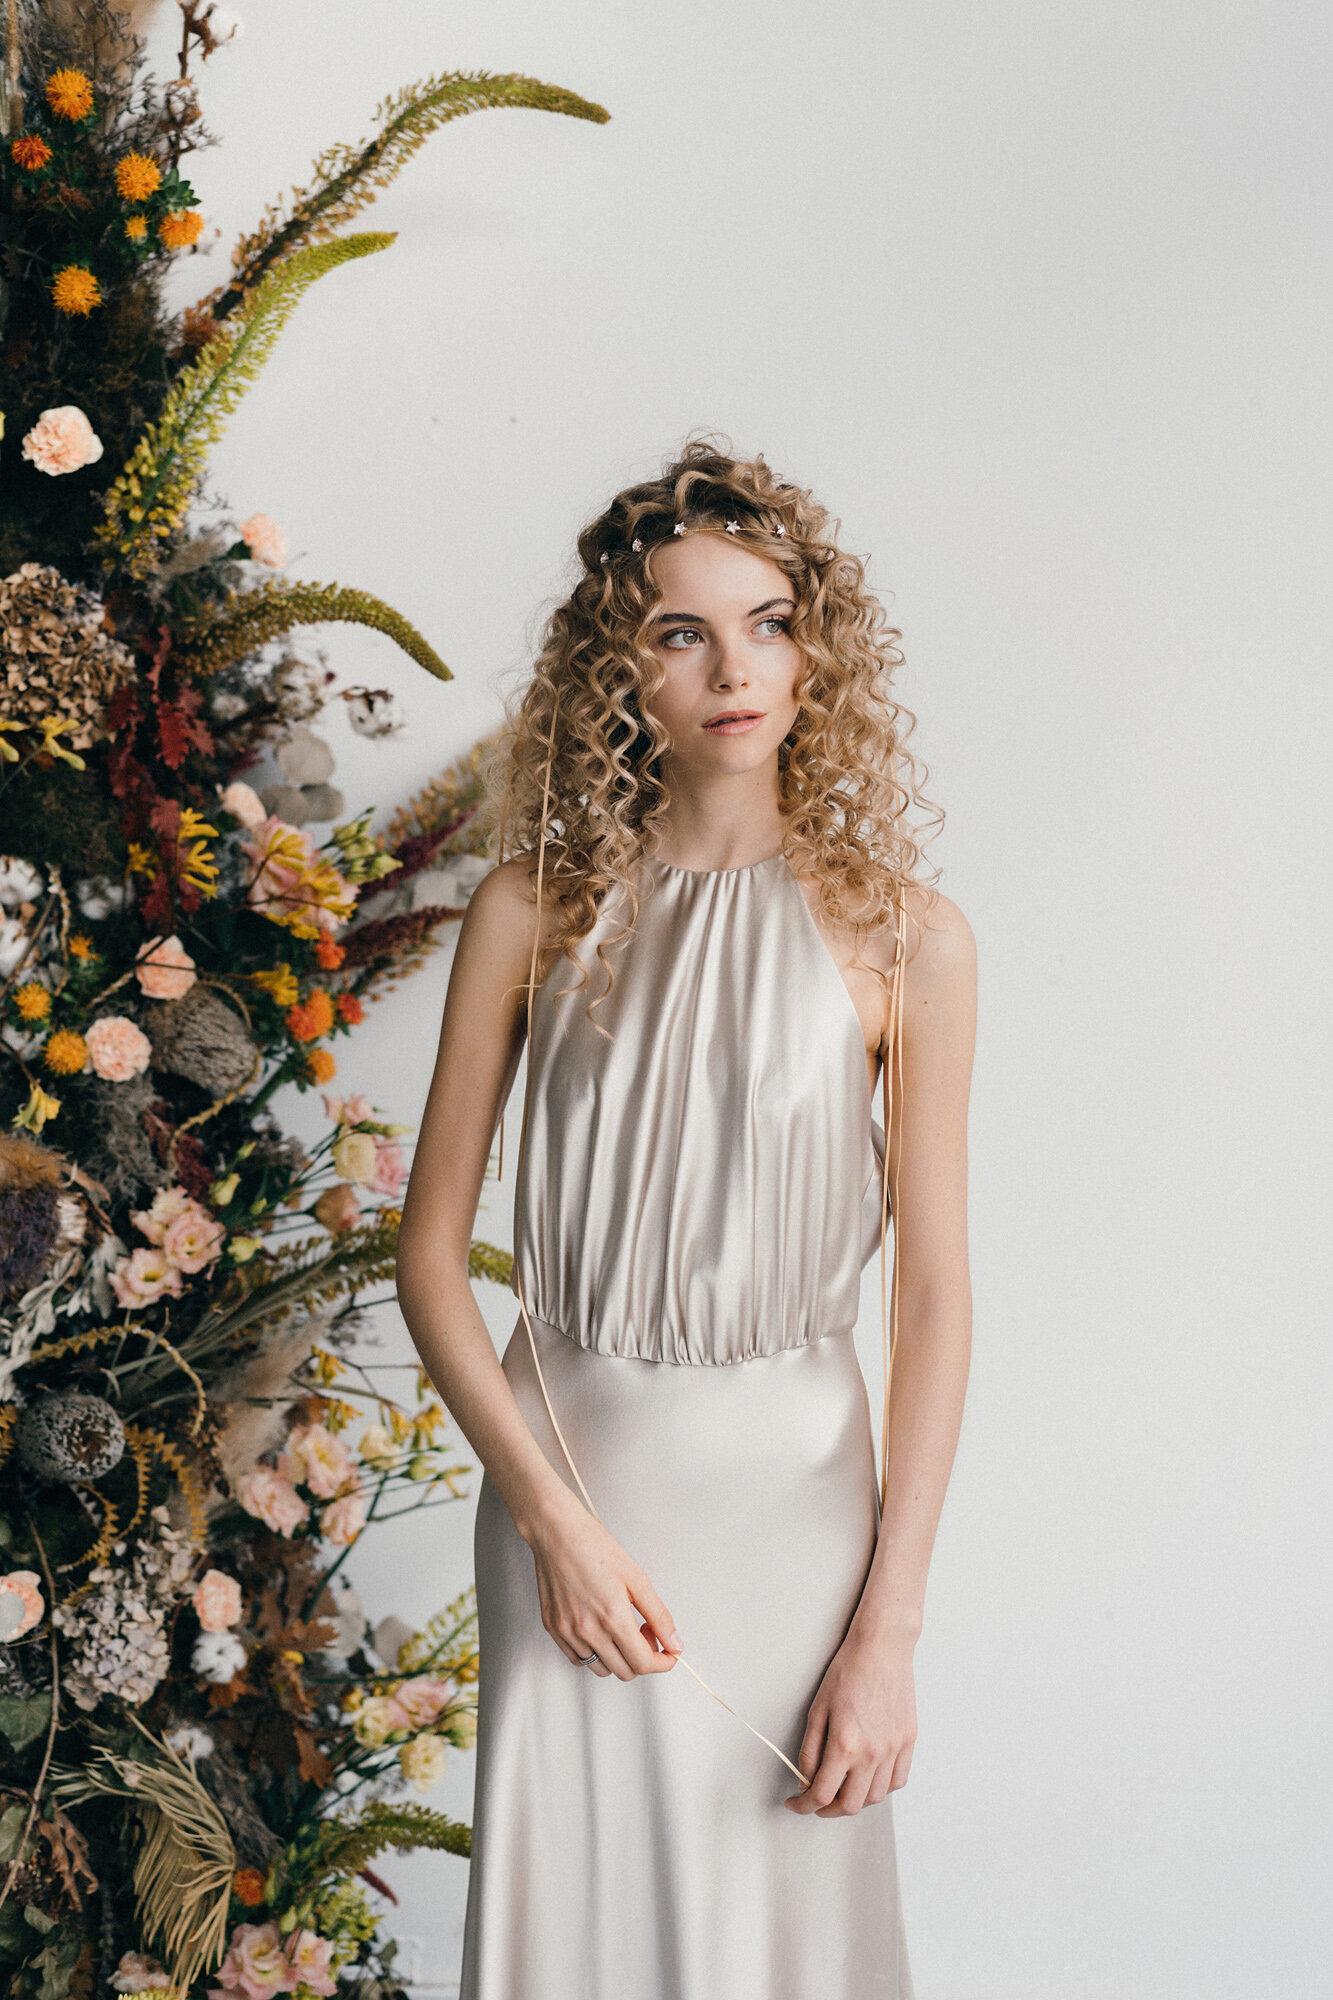 Debbie-Carlisle-Bridal-Accessories-Kate-Beaumont-Wedding-Gowns-Sheffield-Yorkshire-UK-3.jpg